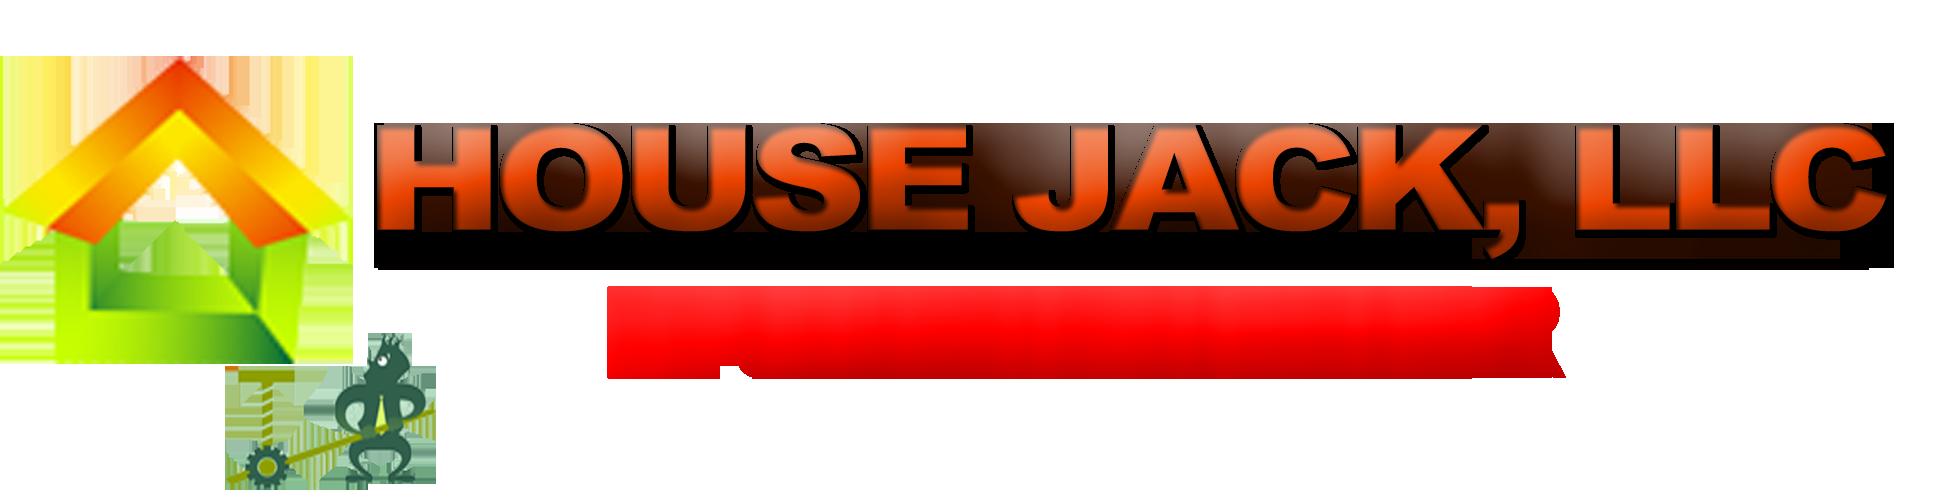 House Jack